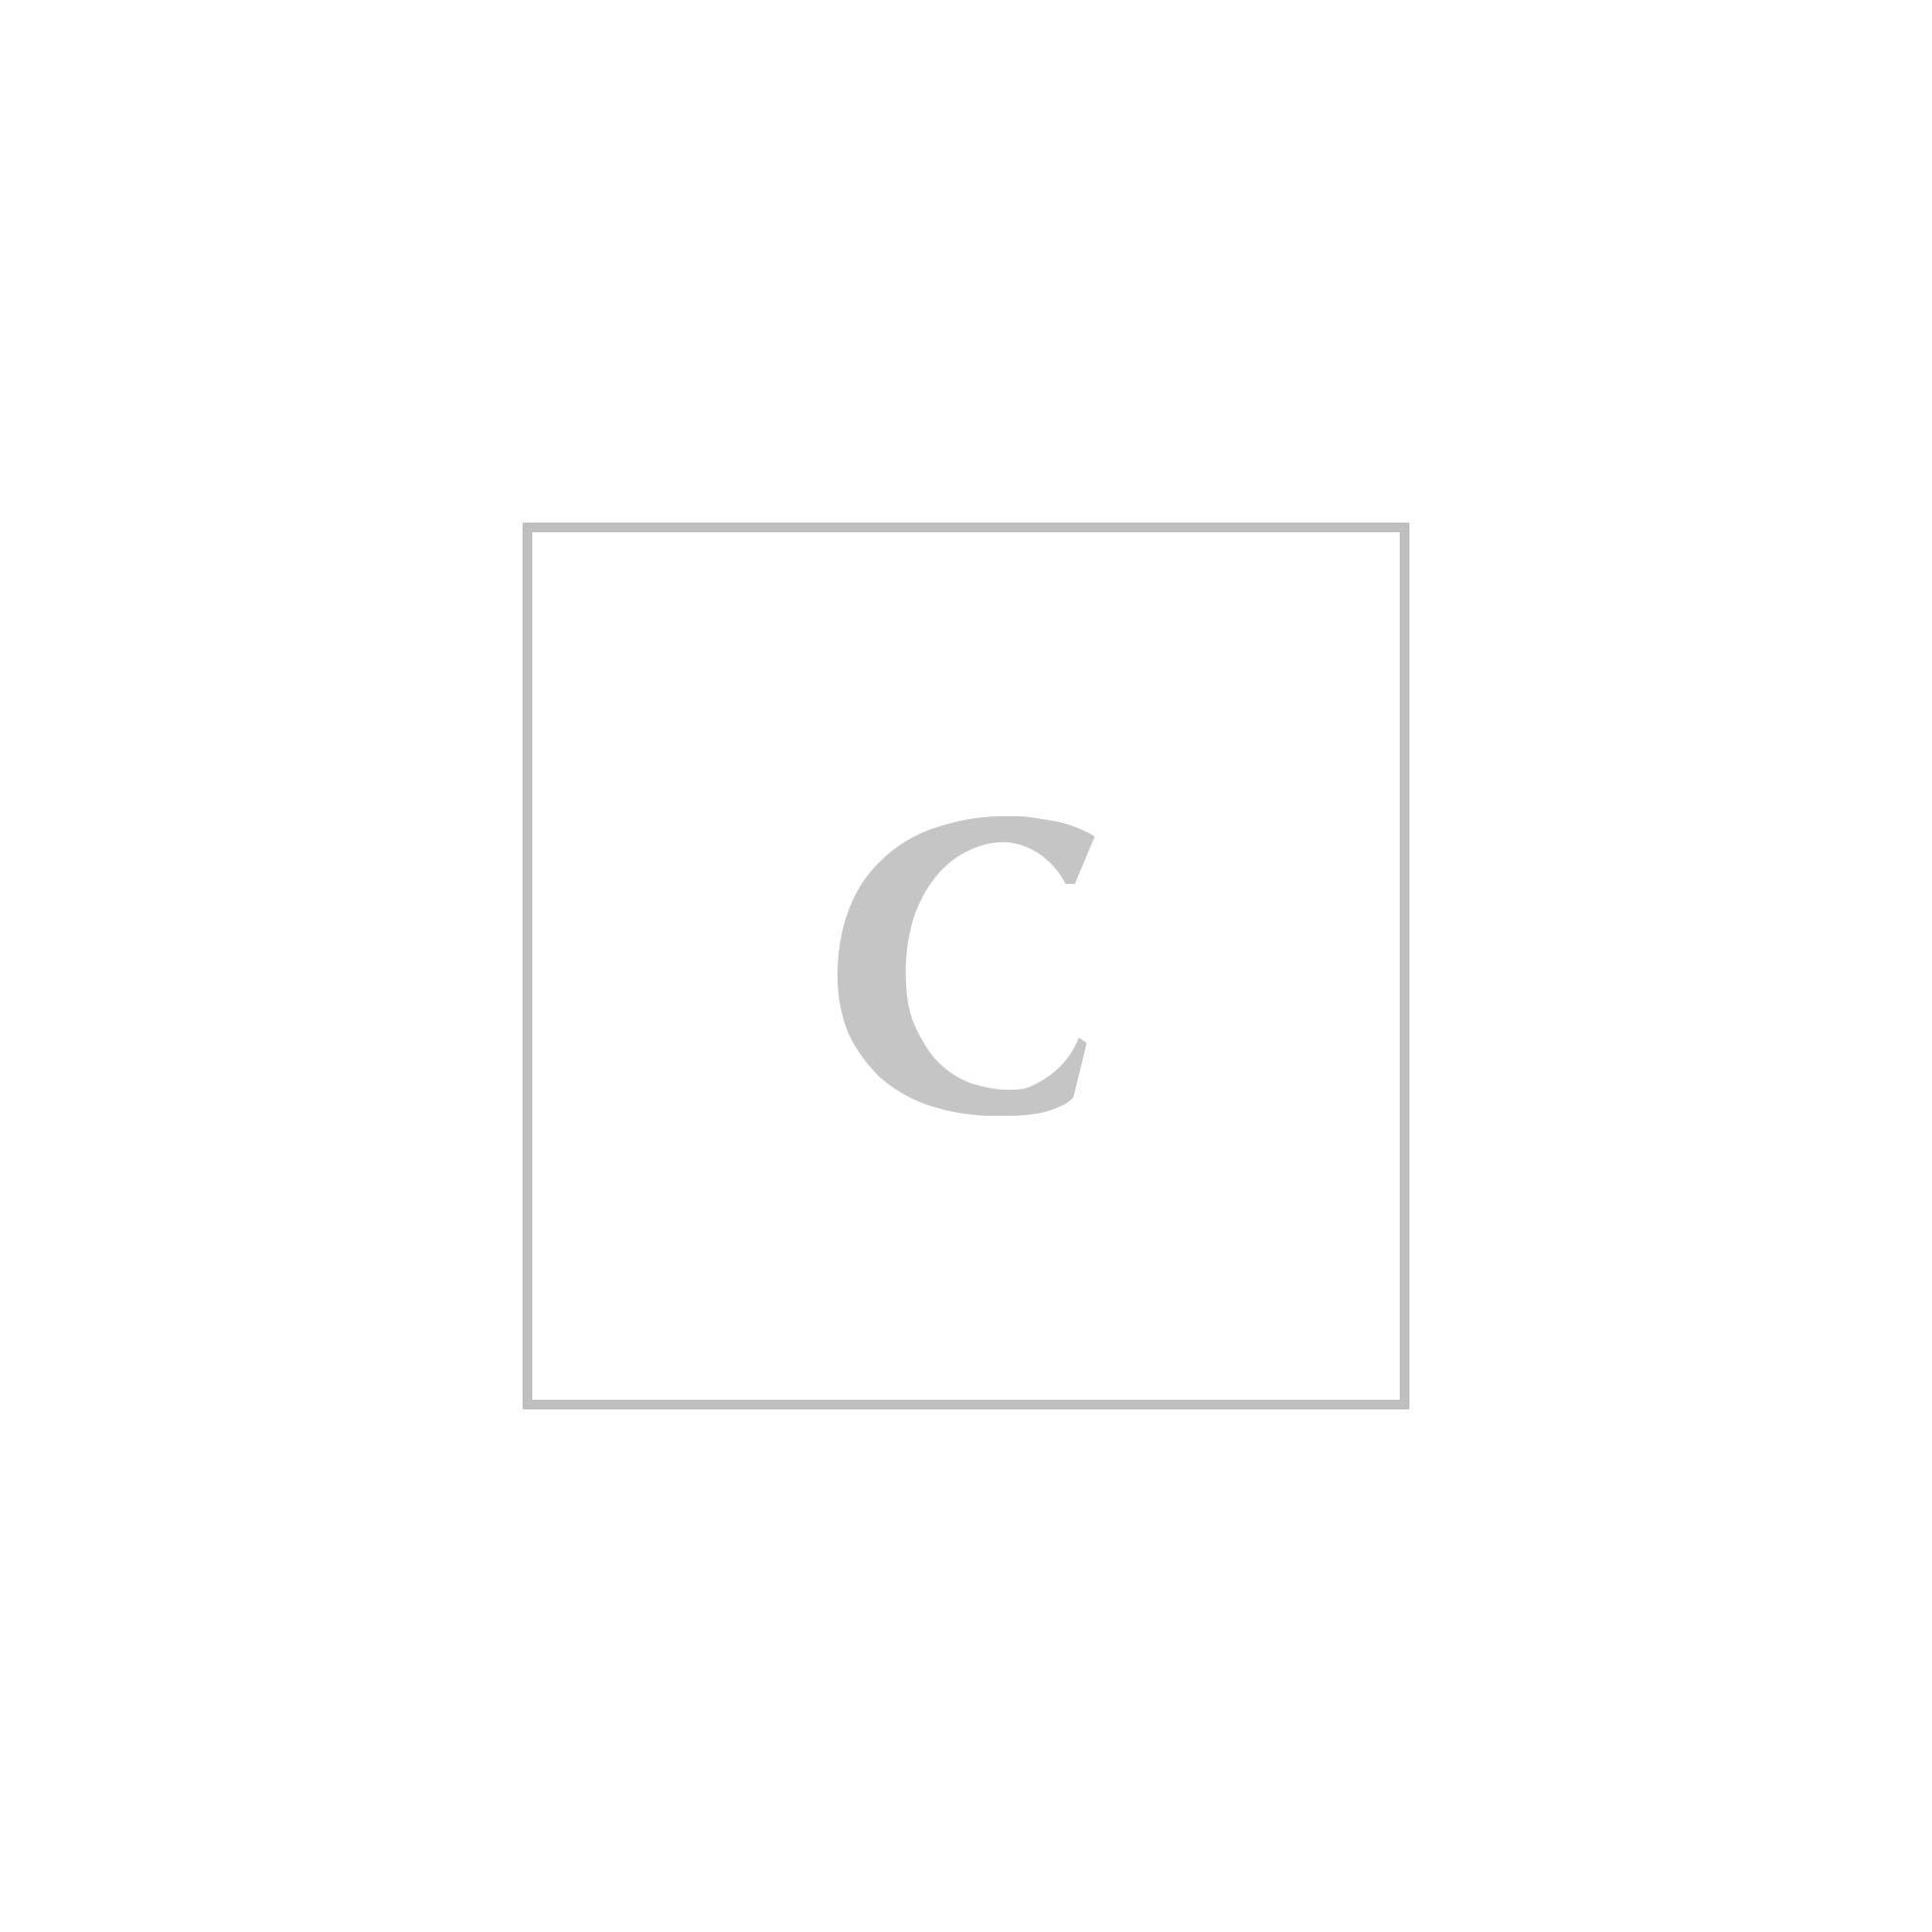 Dolce & gabbana borsa mini pelle stampa iguana